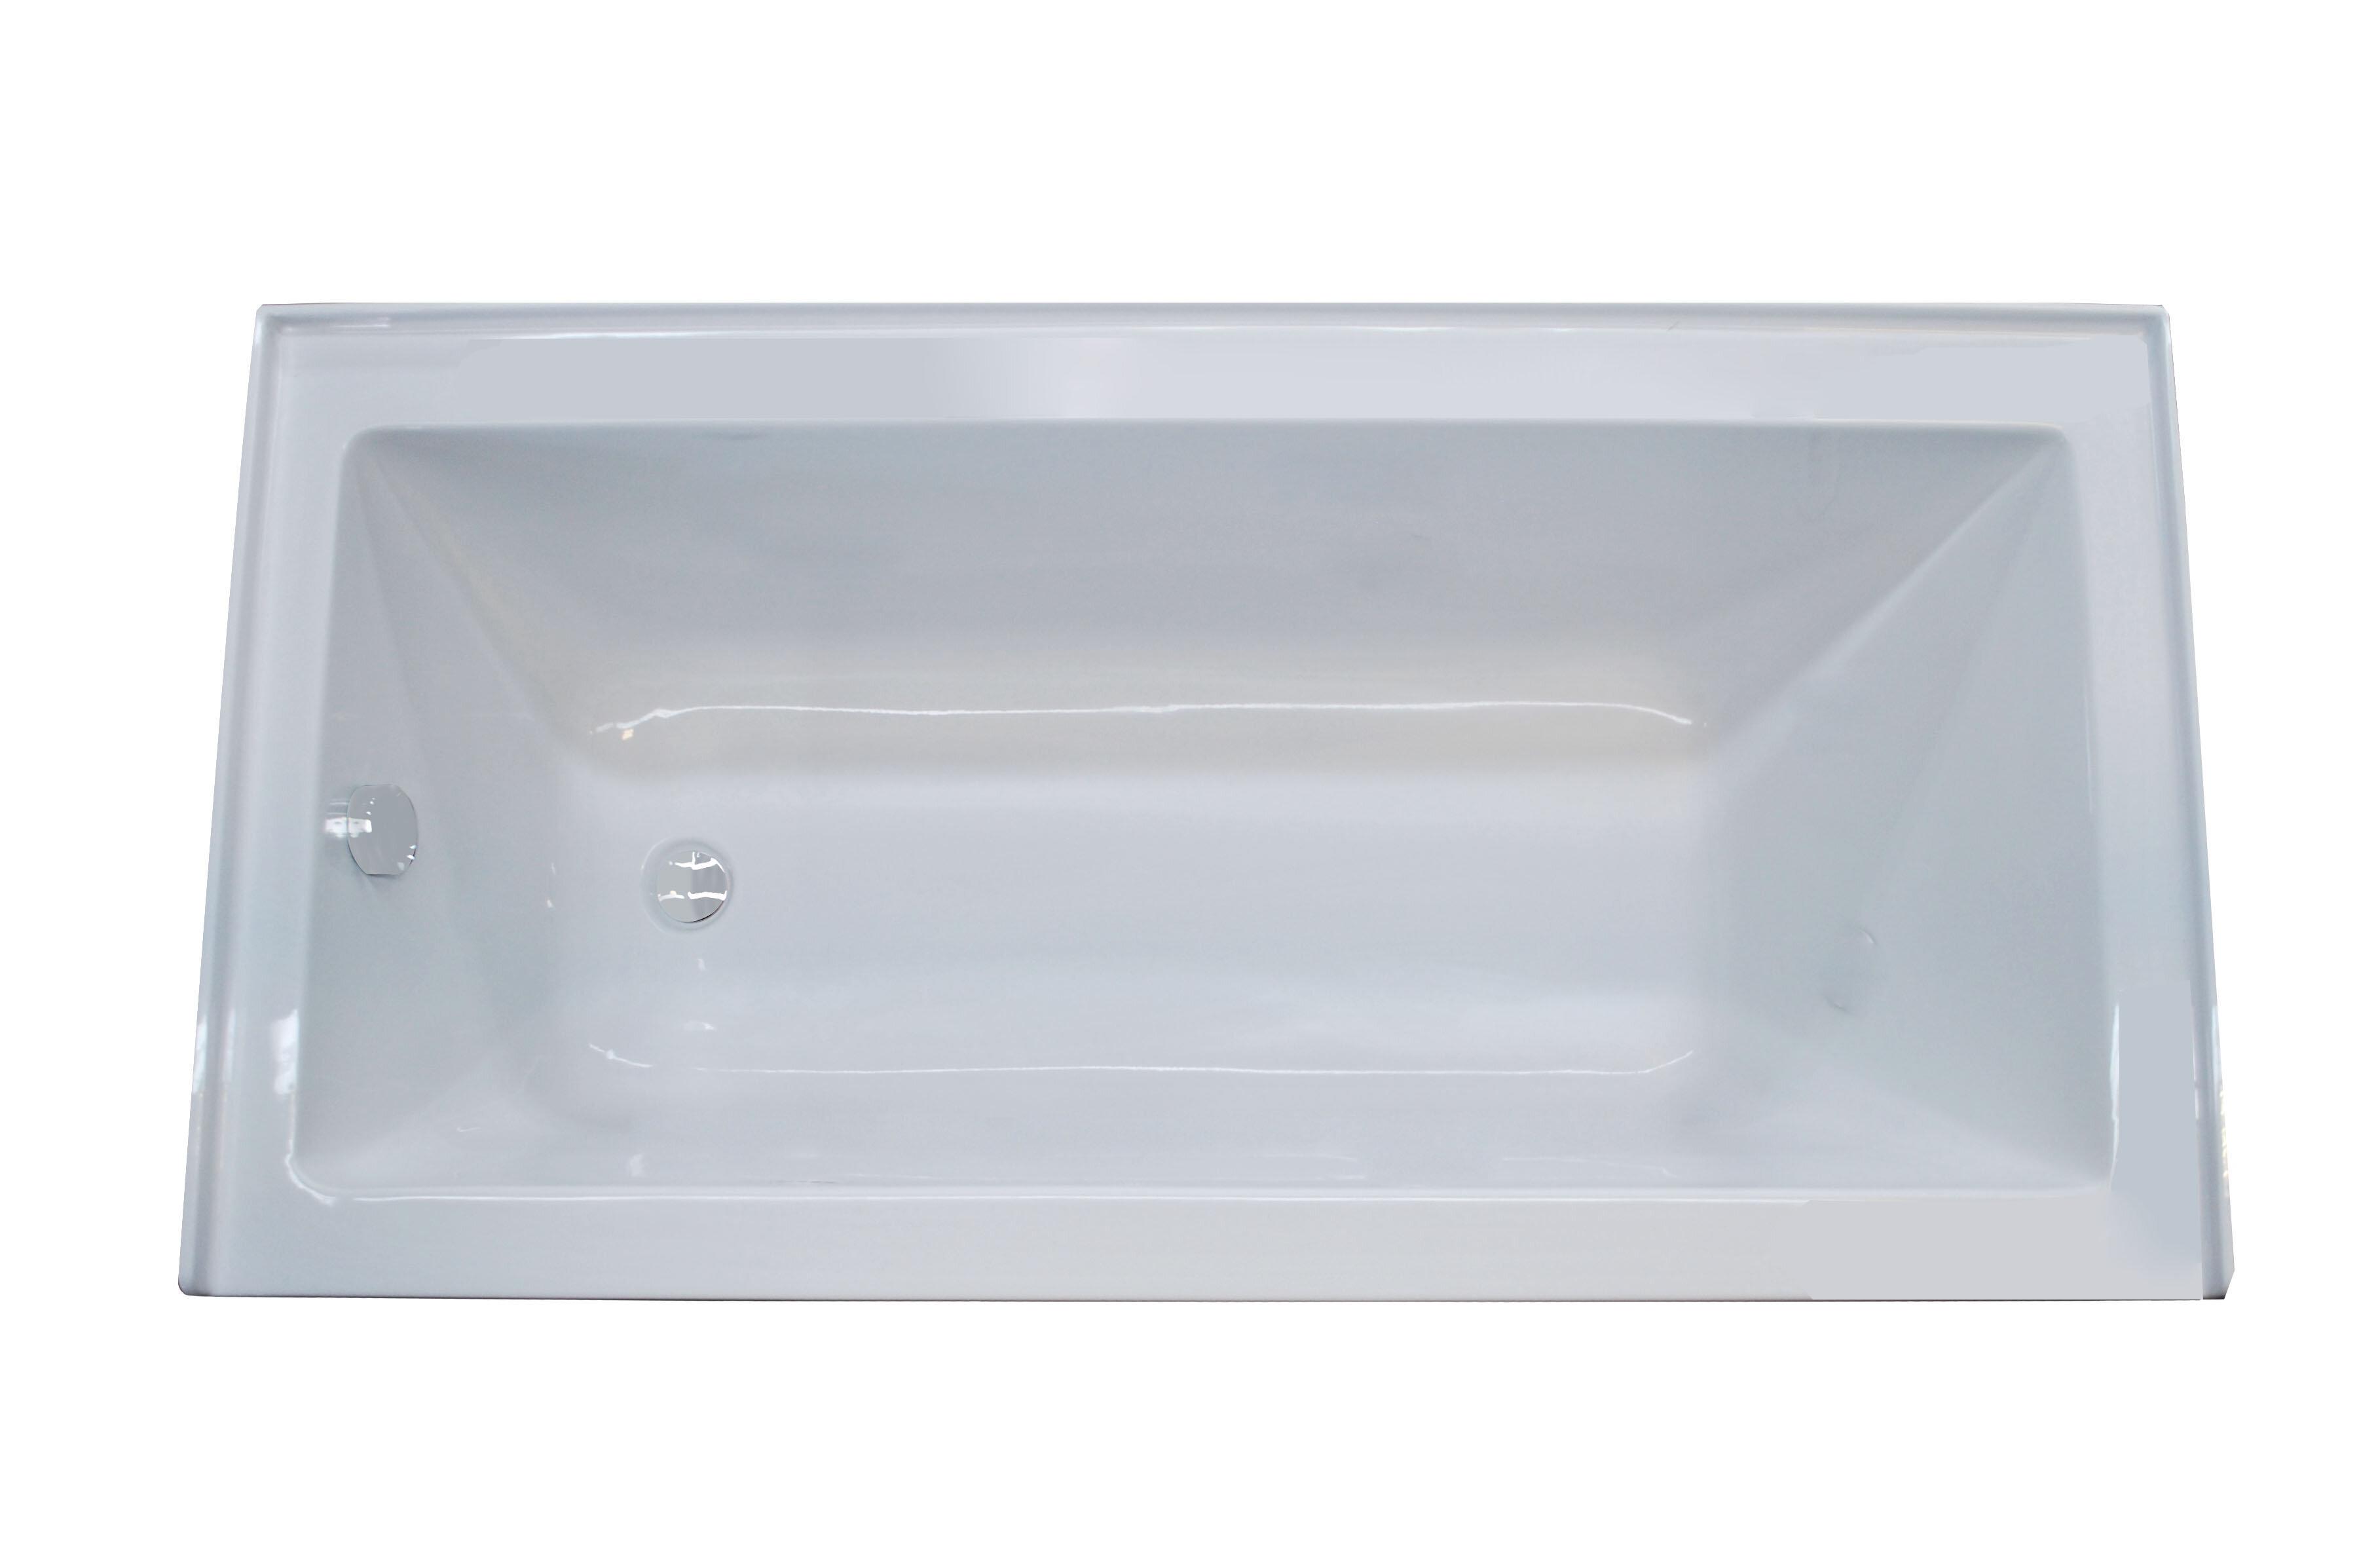 baths bathtub skirted x mirolin new product austin